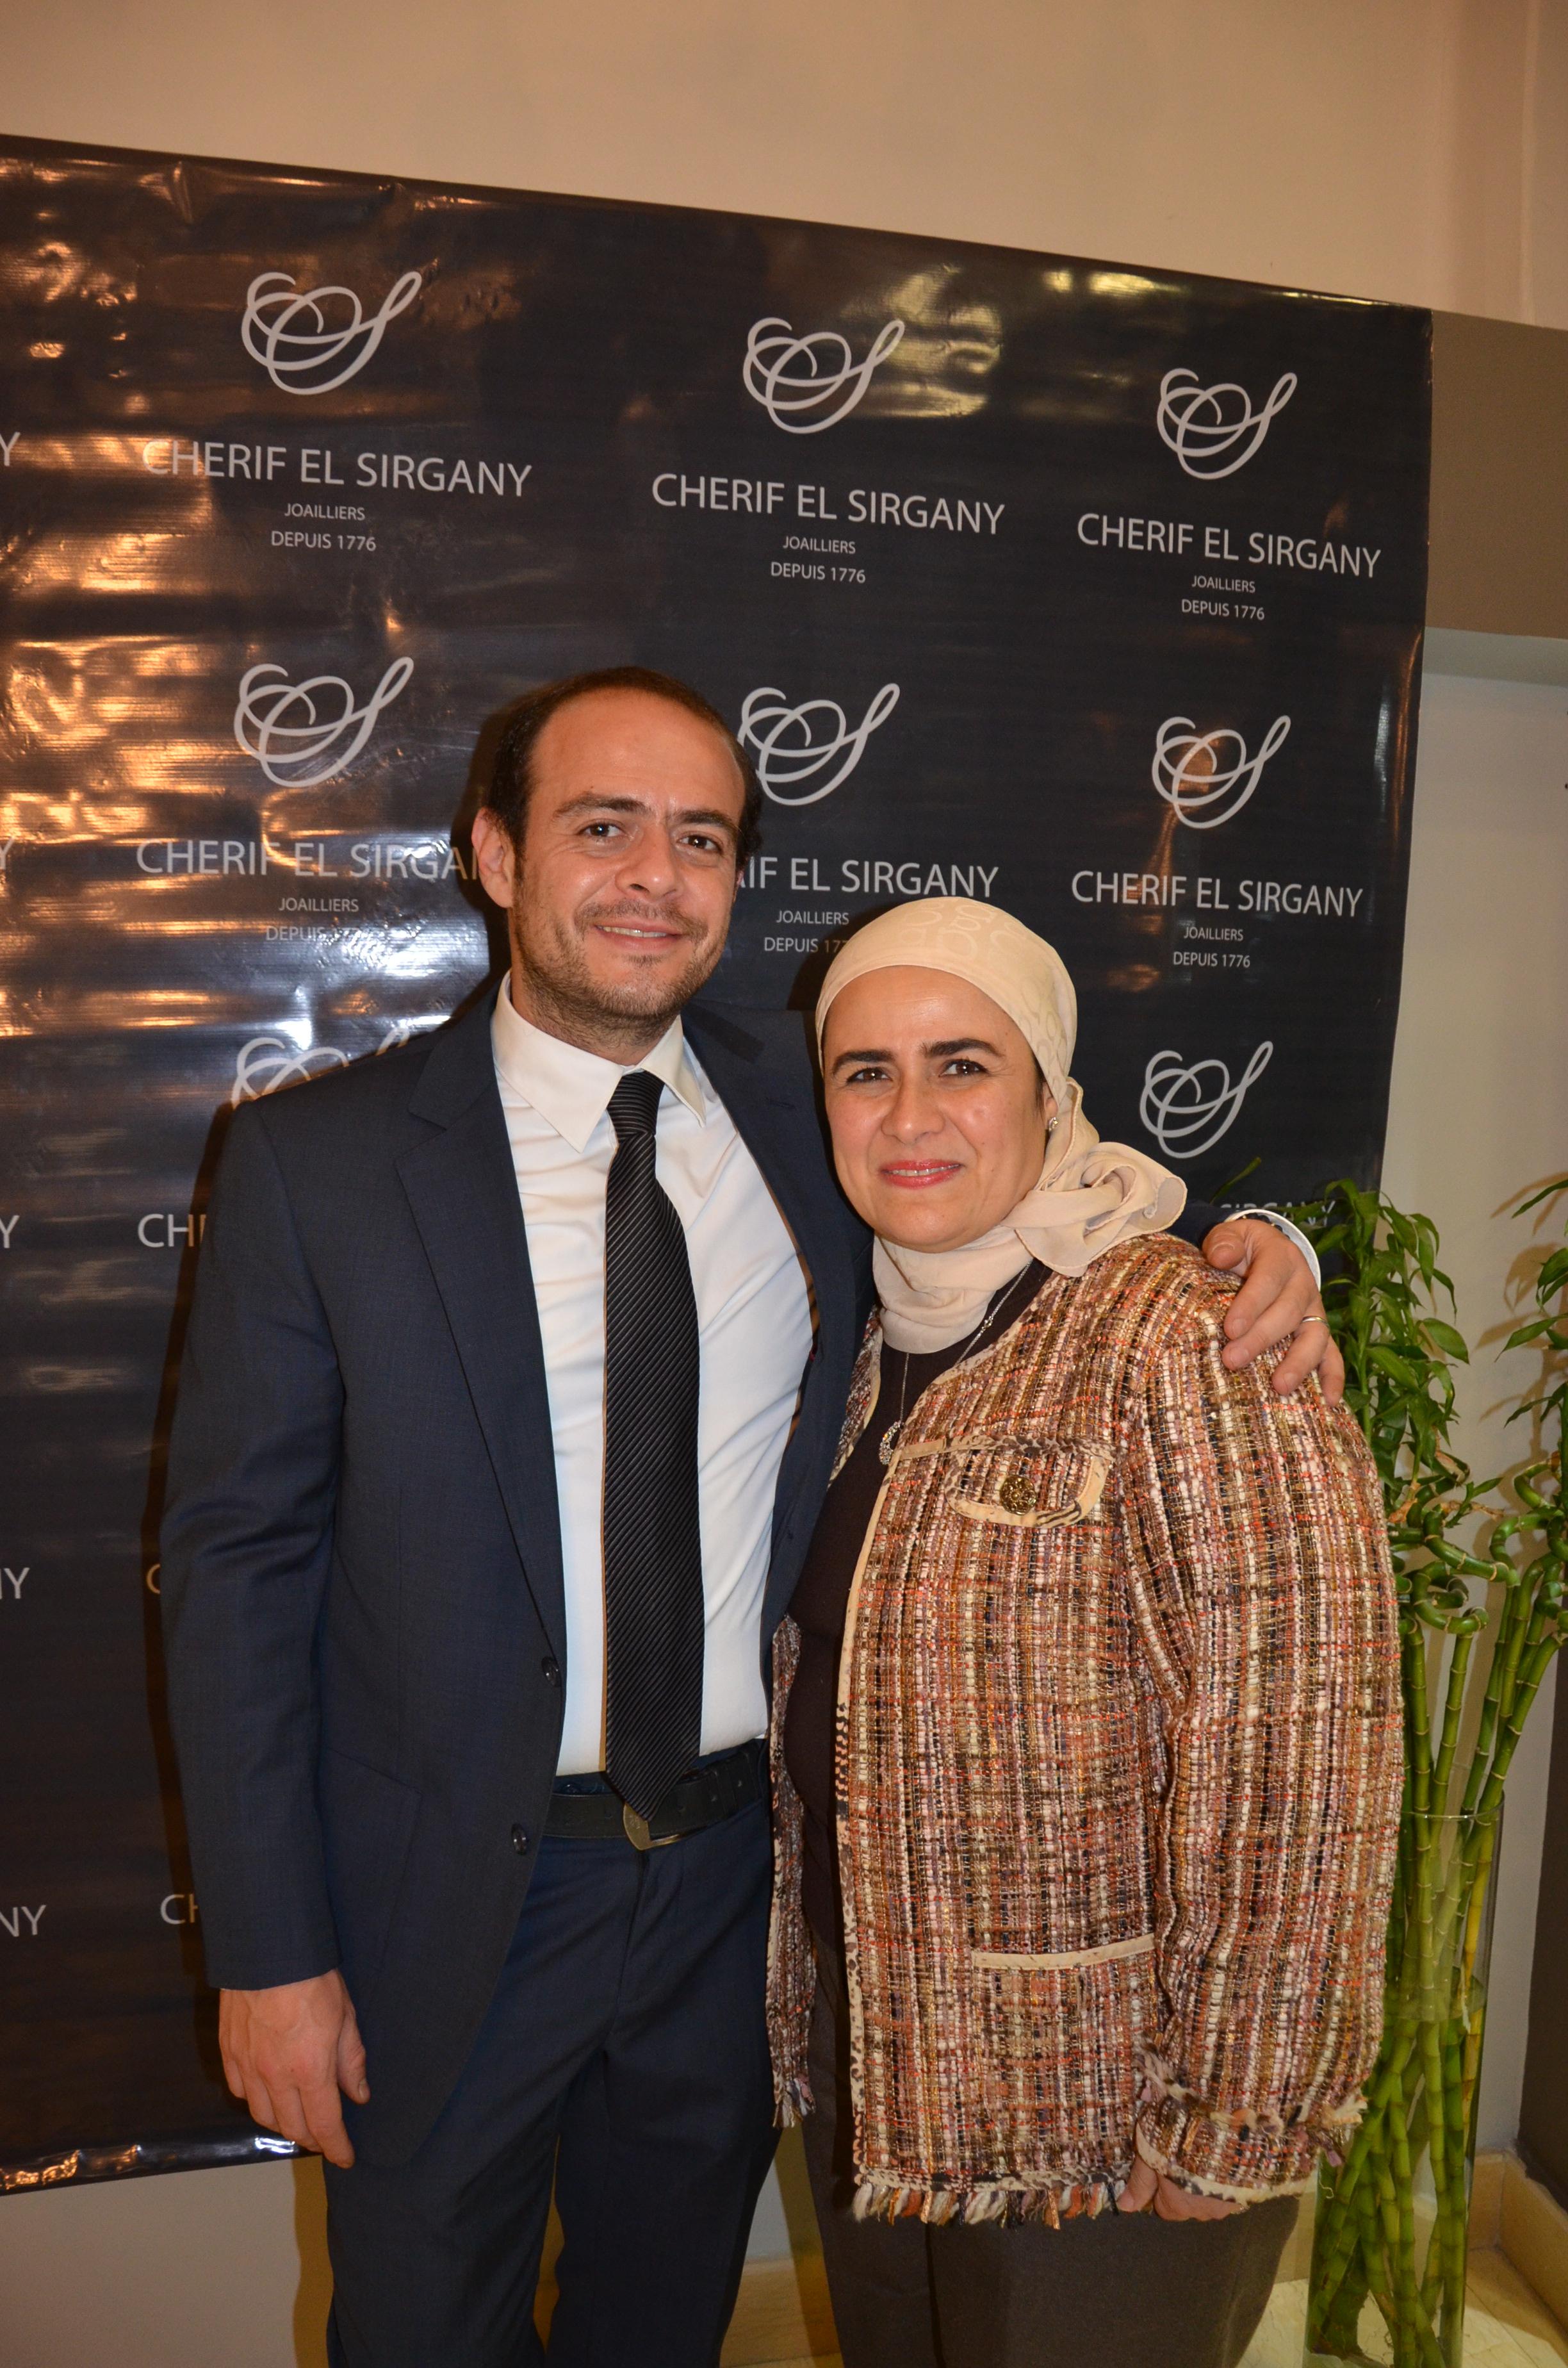 Mr. Mahmoud El Sirgany & Ms. Sherine El Sirgany